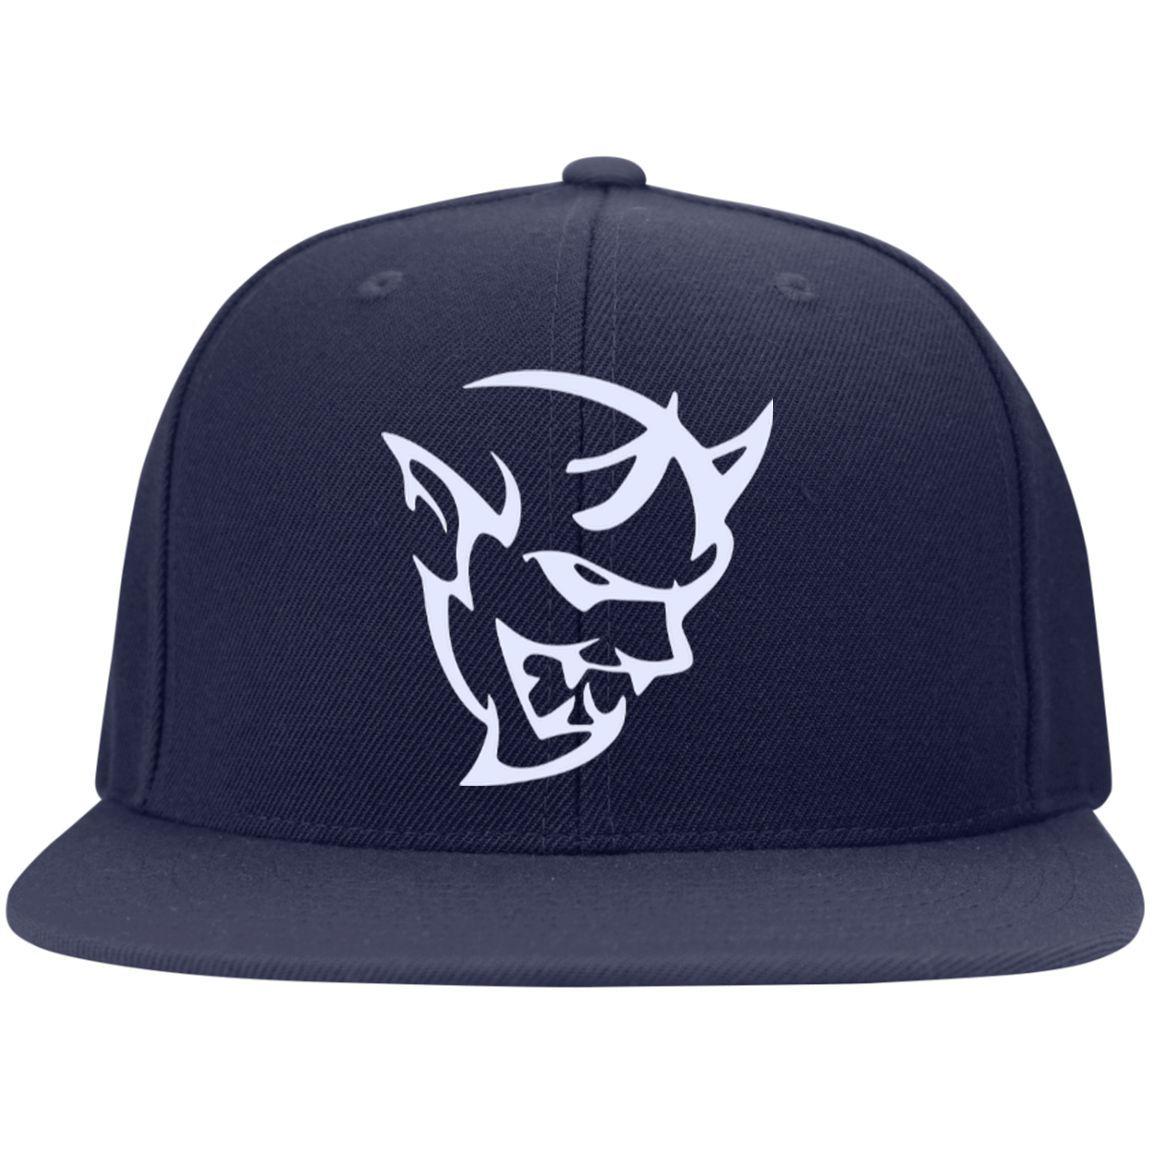 DODGE DEMON 2 STC19 Sport-Tek Flat Bill High-Profile Snapback Hat